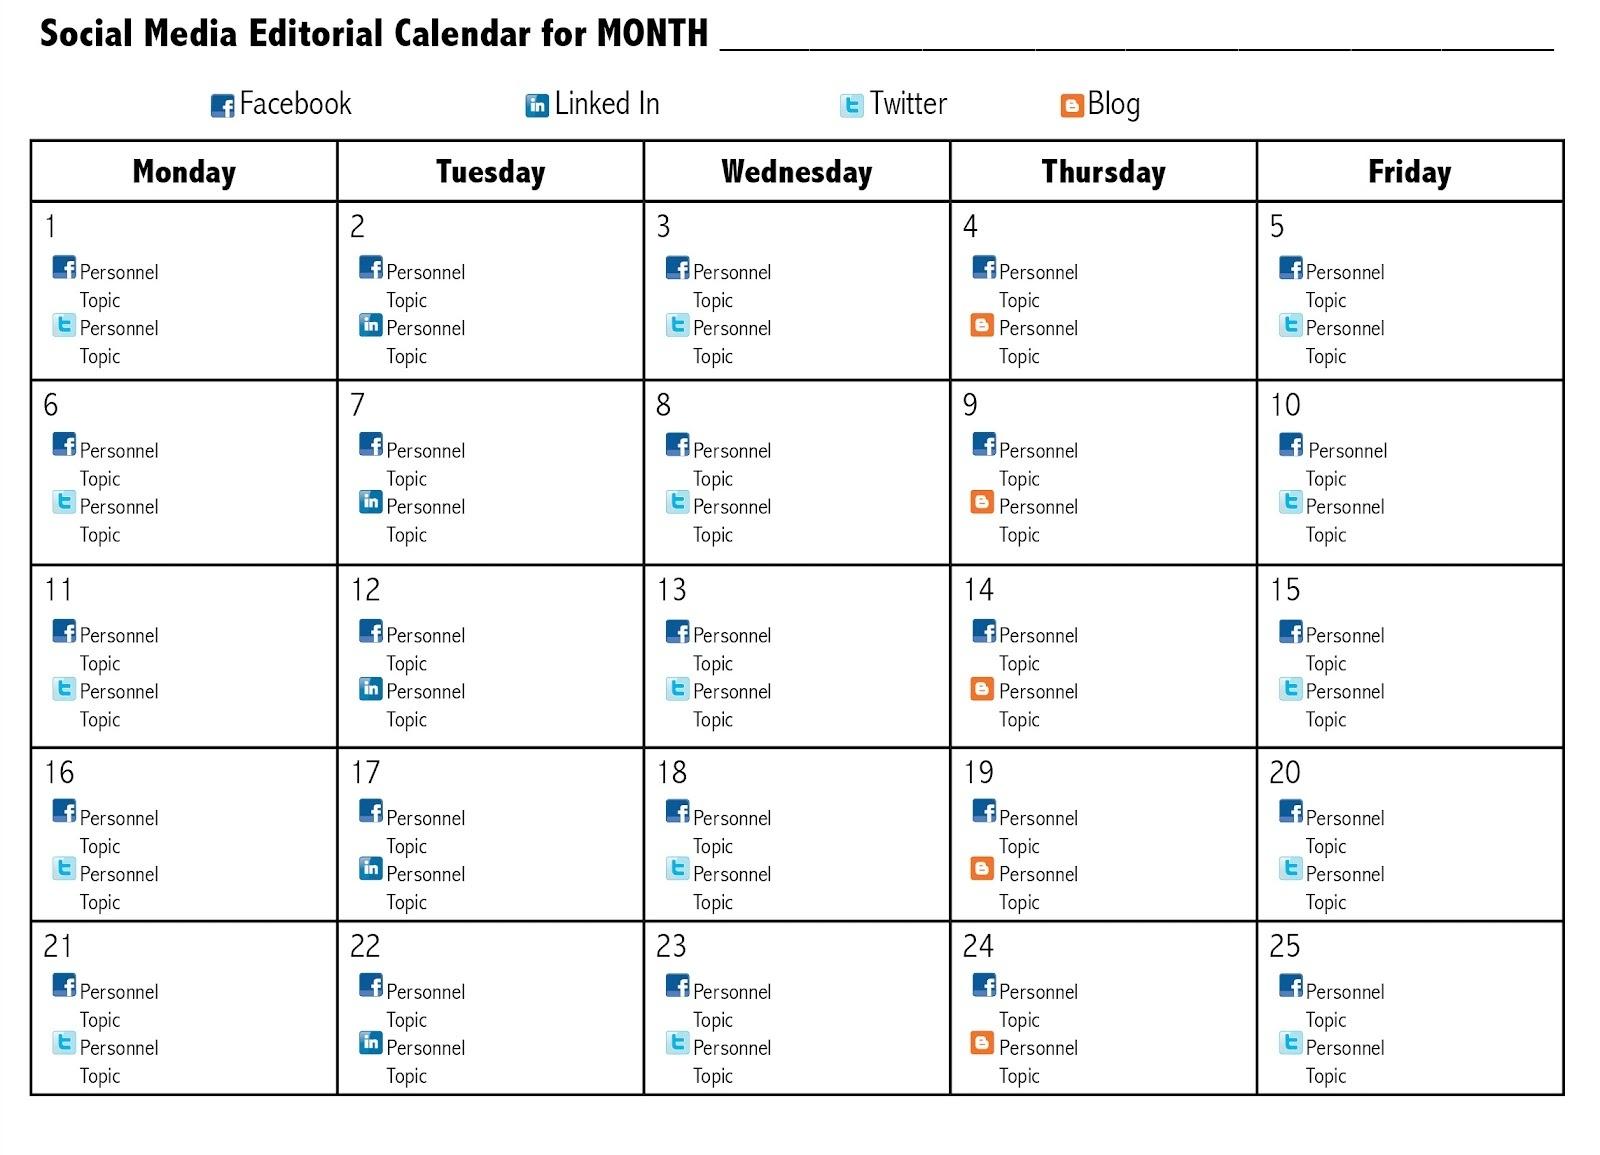 Social Media Calendar Template - Gerhard-Leixl.tk  Social Content Calendar Template Monthly